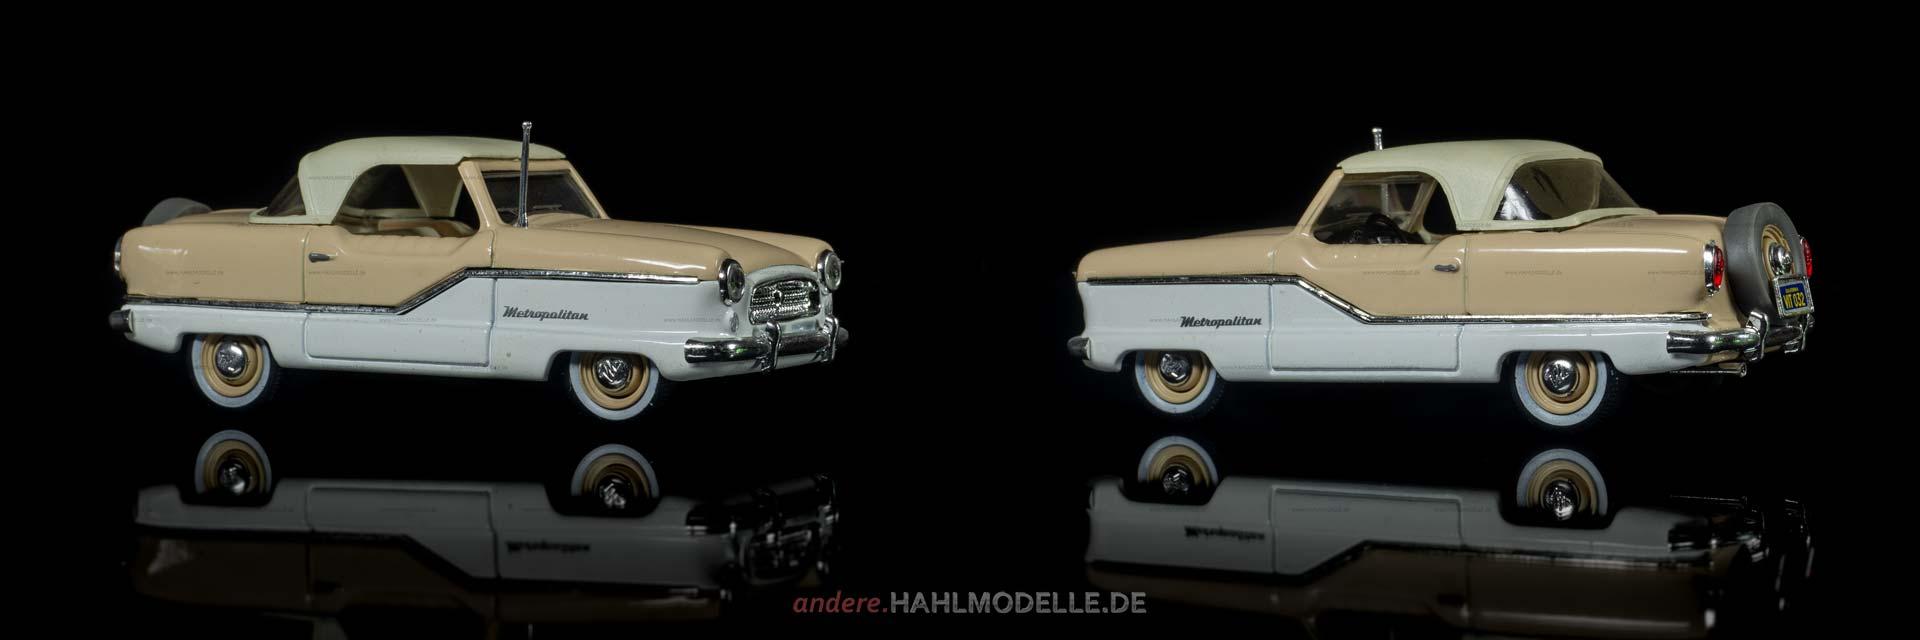 Nash Metropolitan | Cabriolet | Vitesse | 1:43 | www.andere.hahlmodelle.de